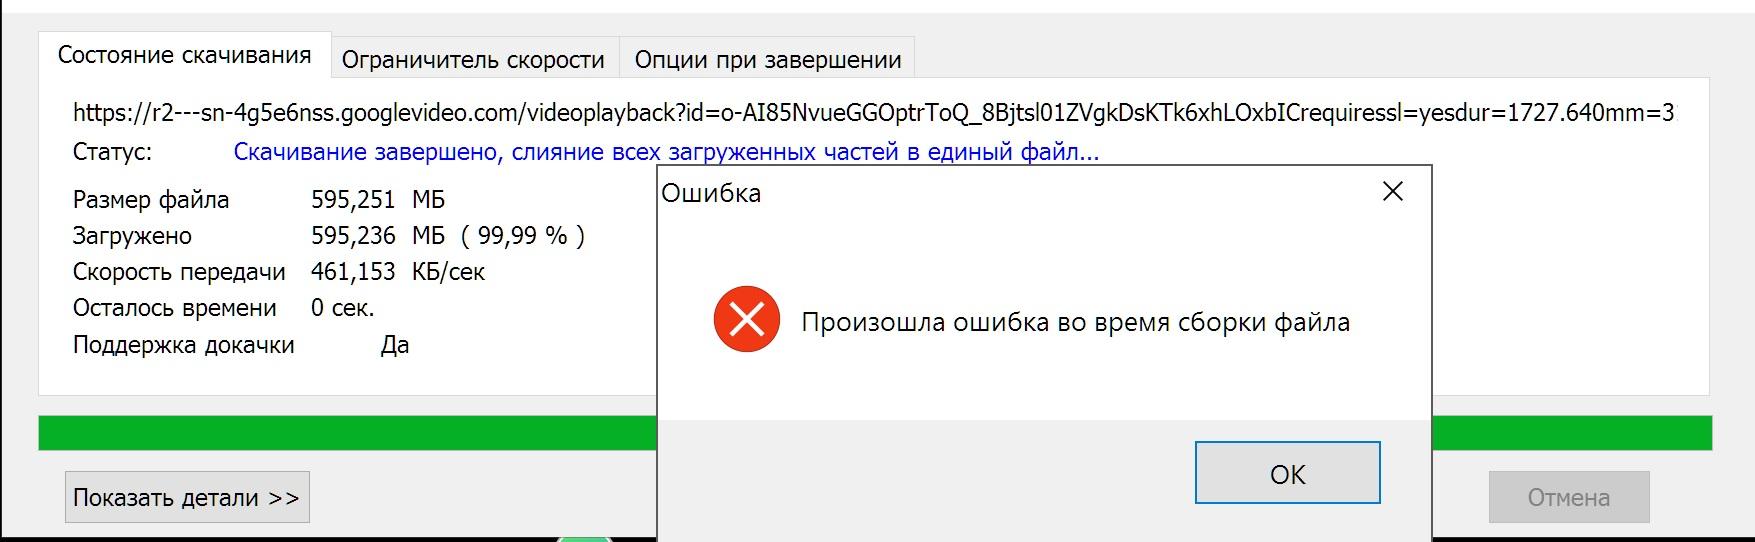 Ошибка во время сборки файла